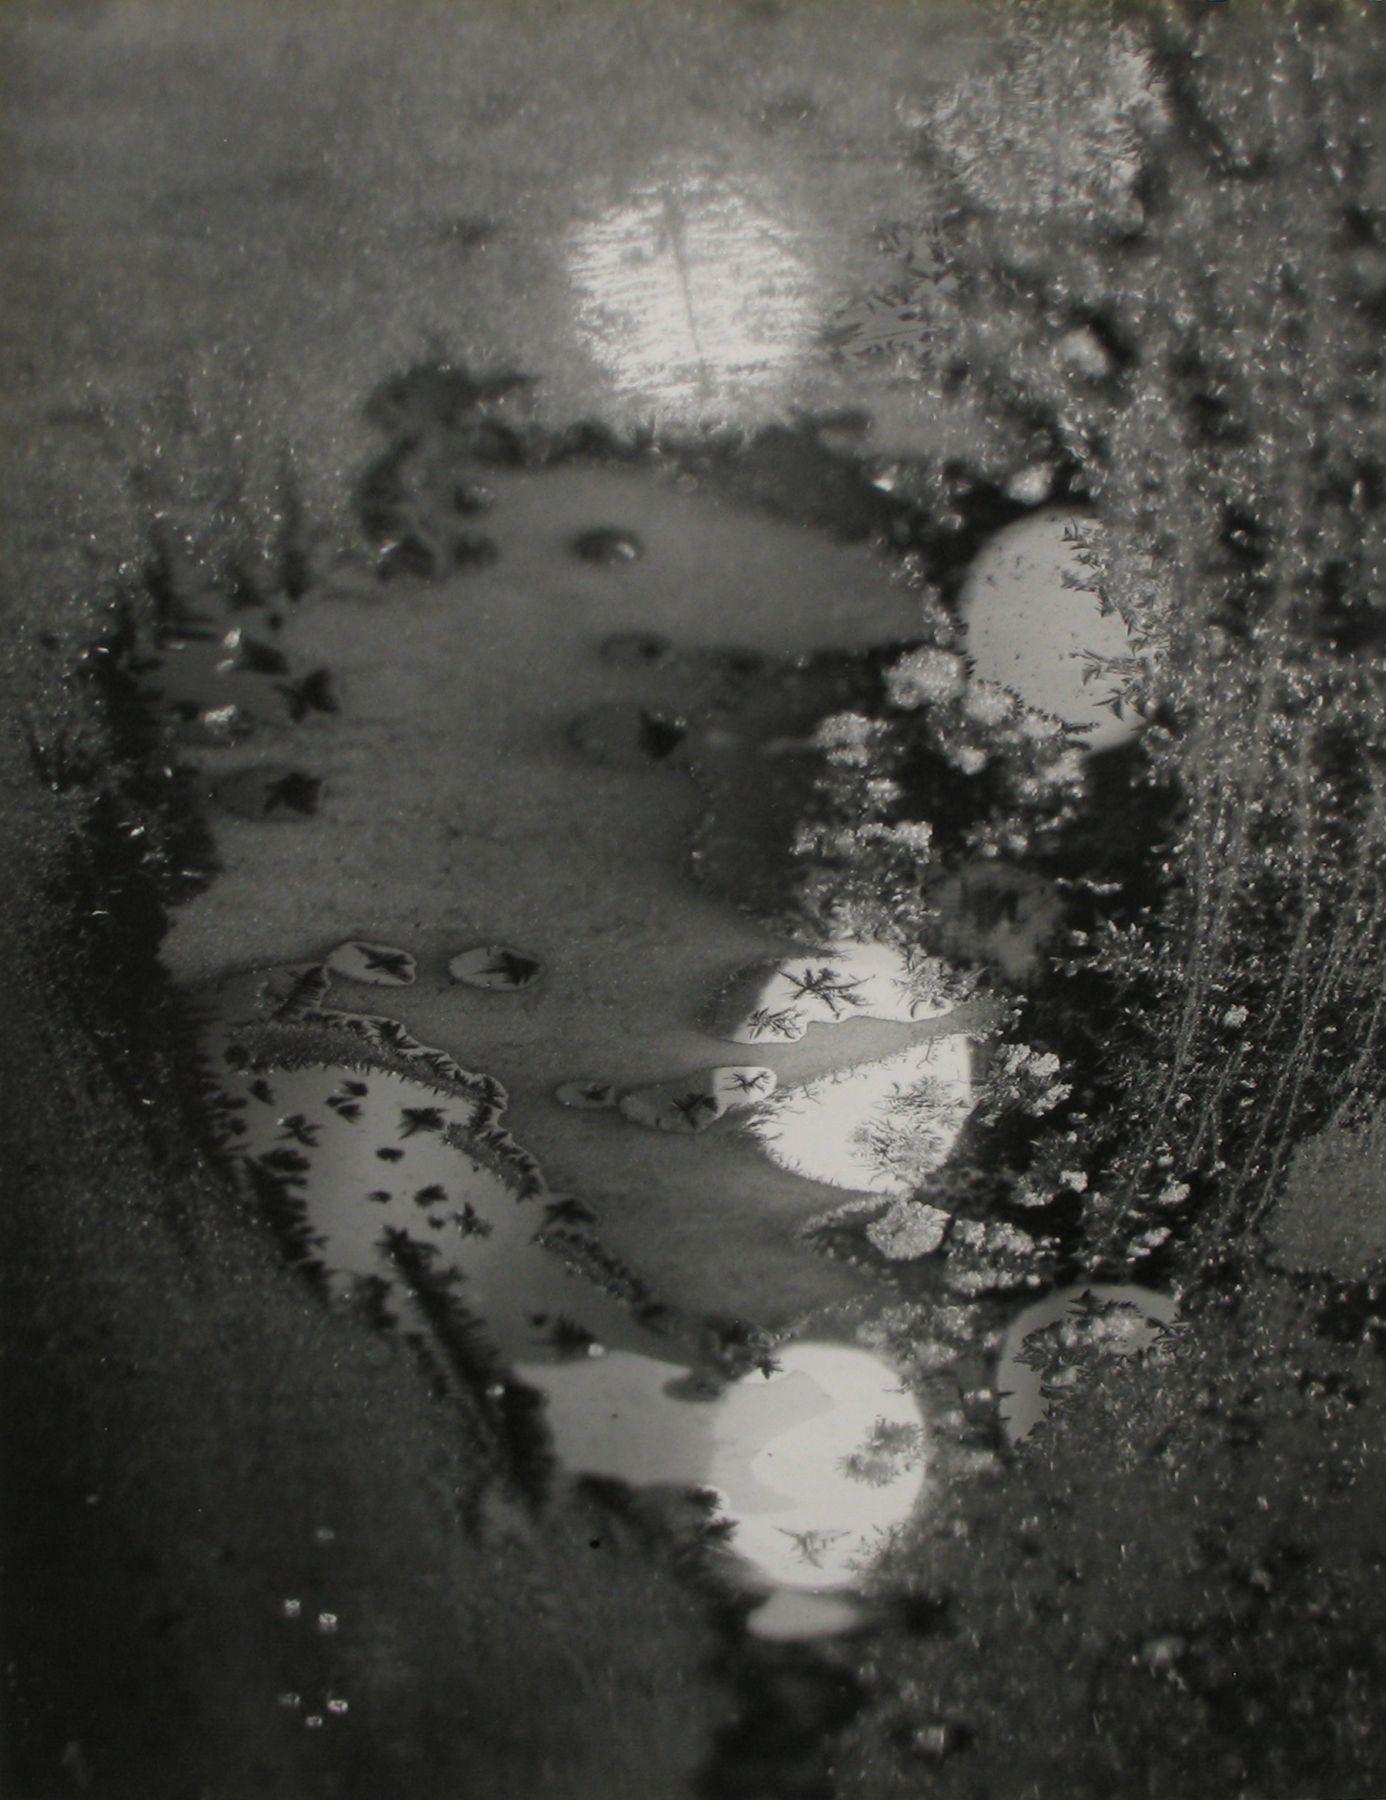 Minor White - Beginnings, 1962 - Howard Greenberg Gallery